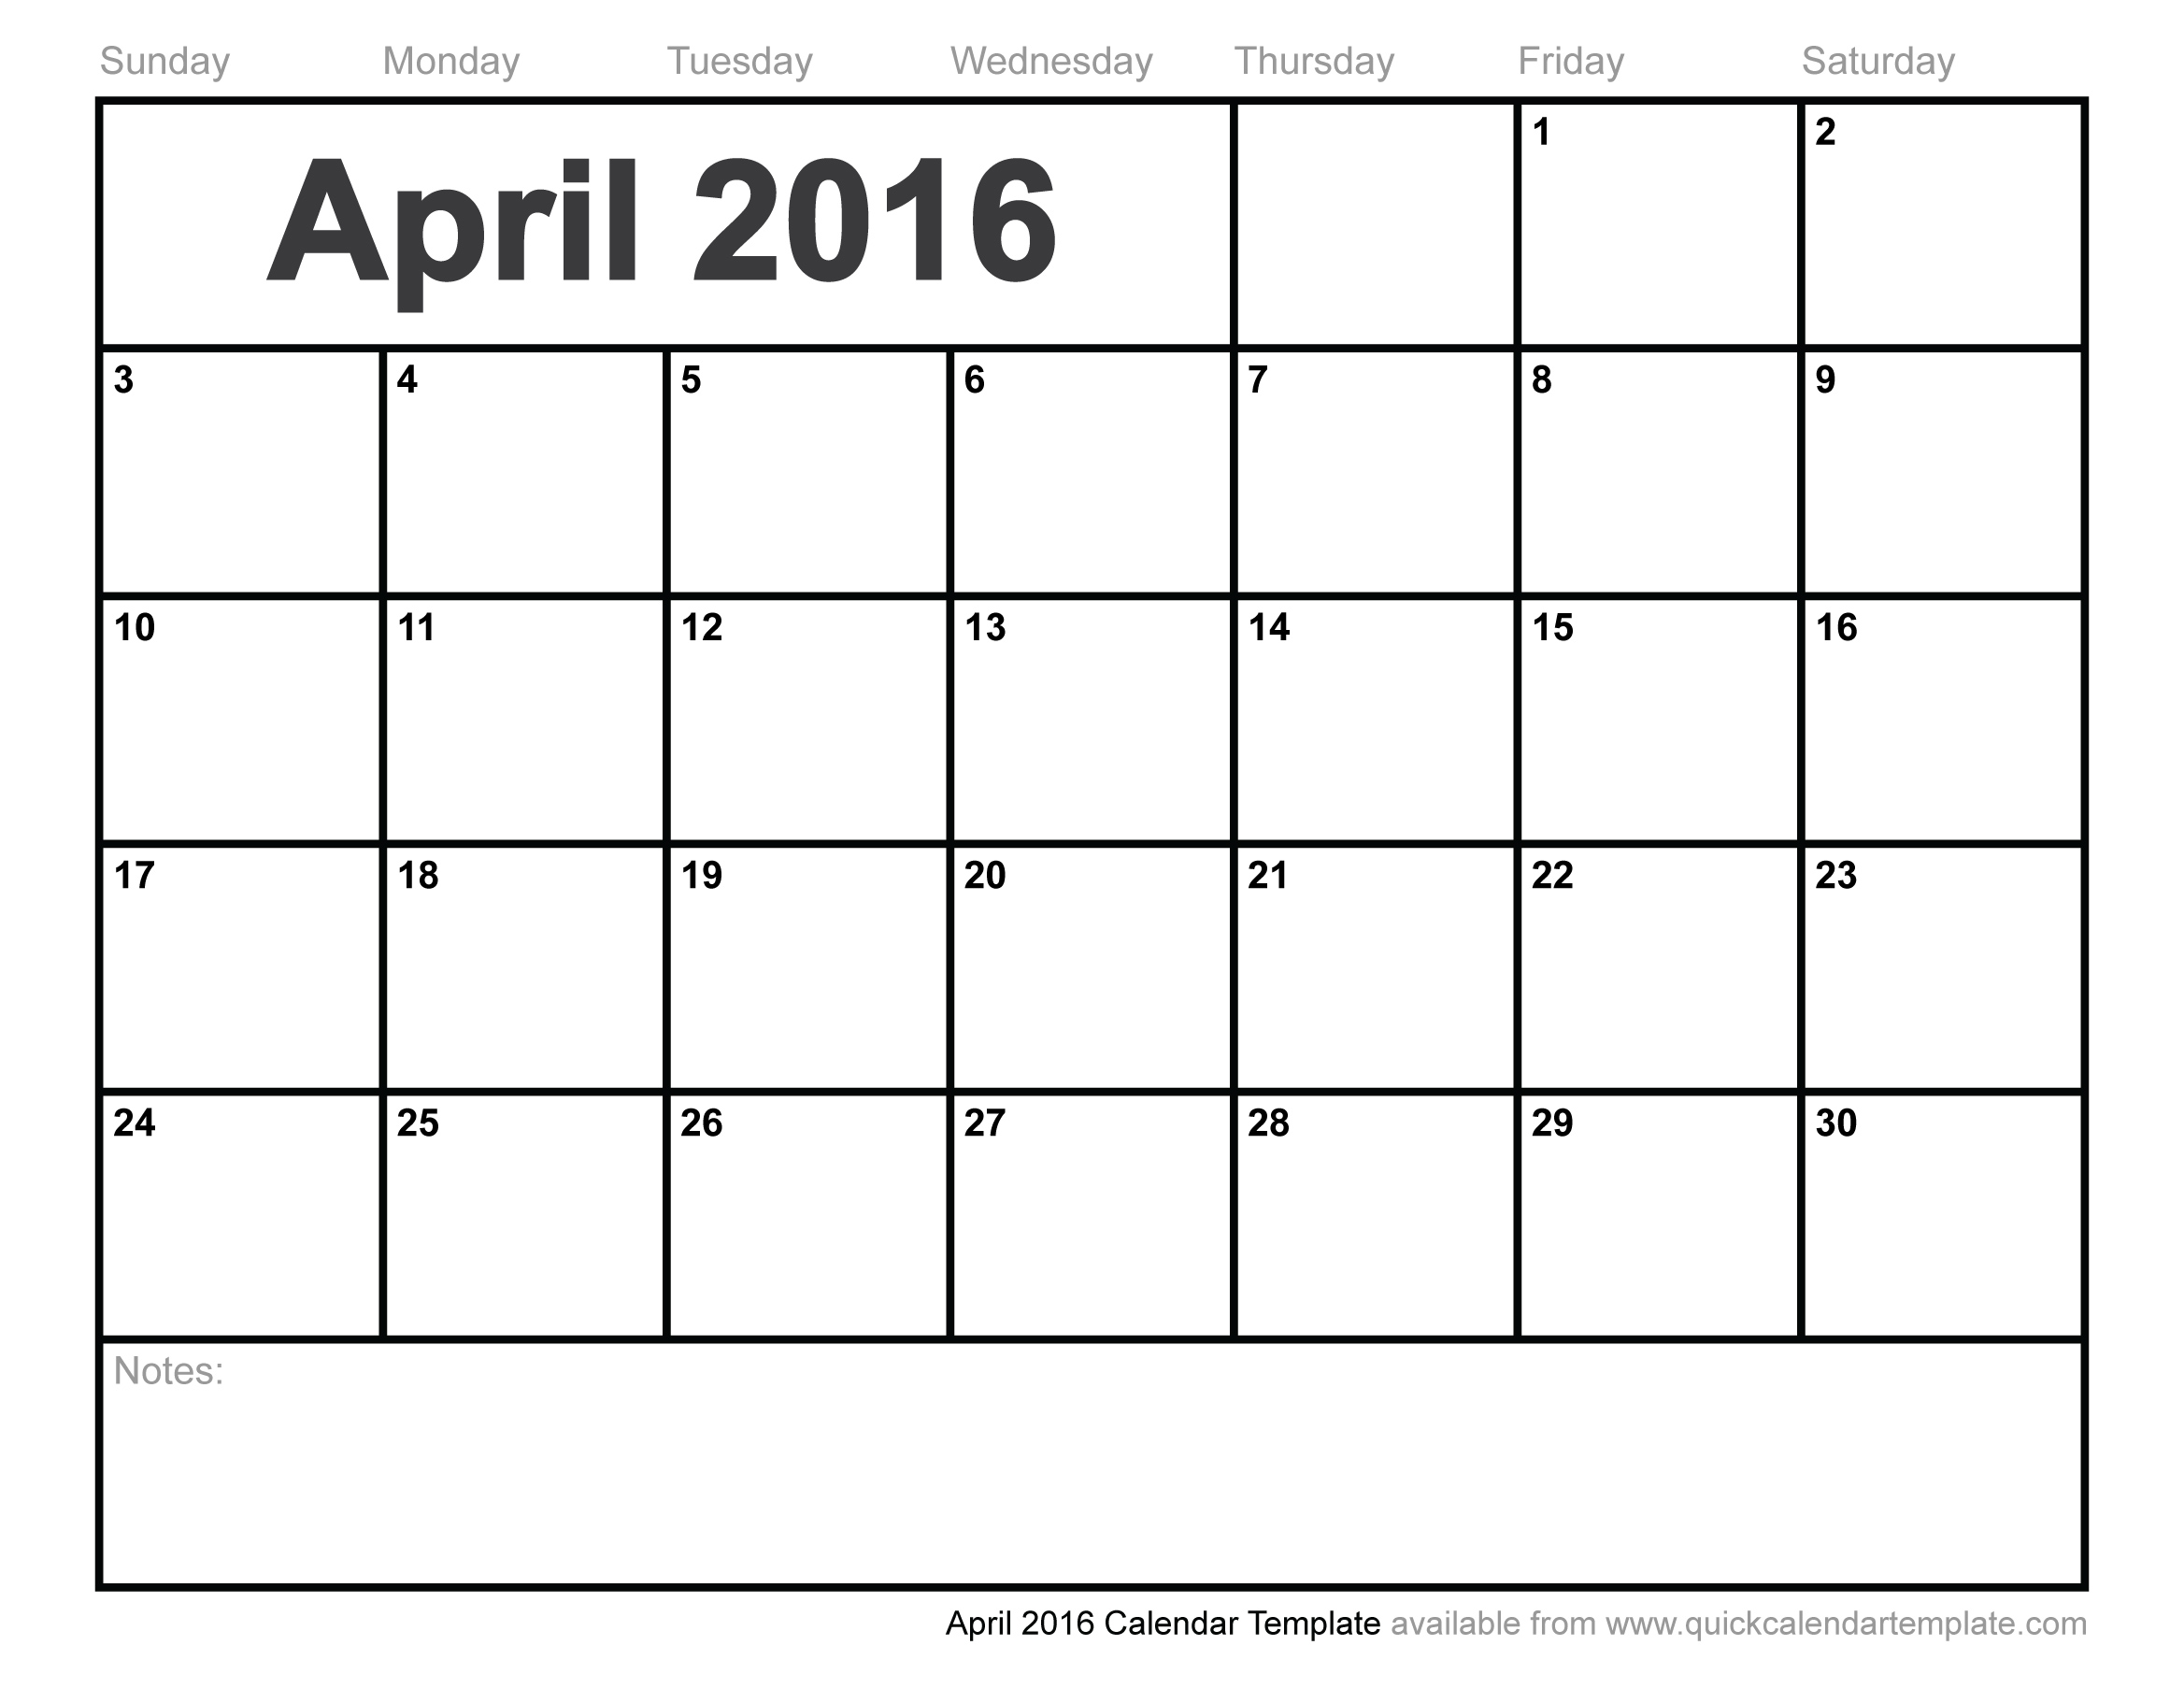 December 2017 Calendar Printable Monthly Magnificent April 2016